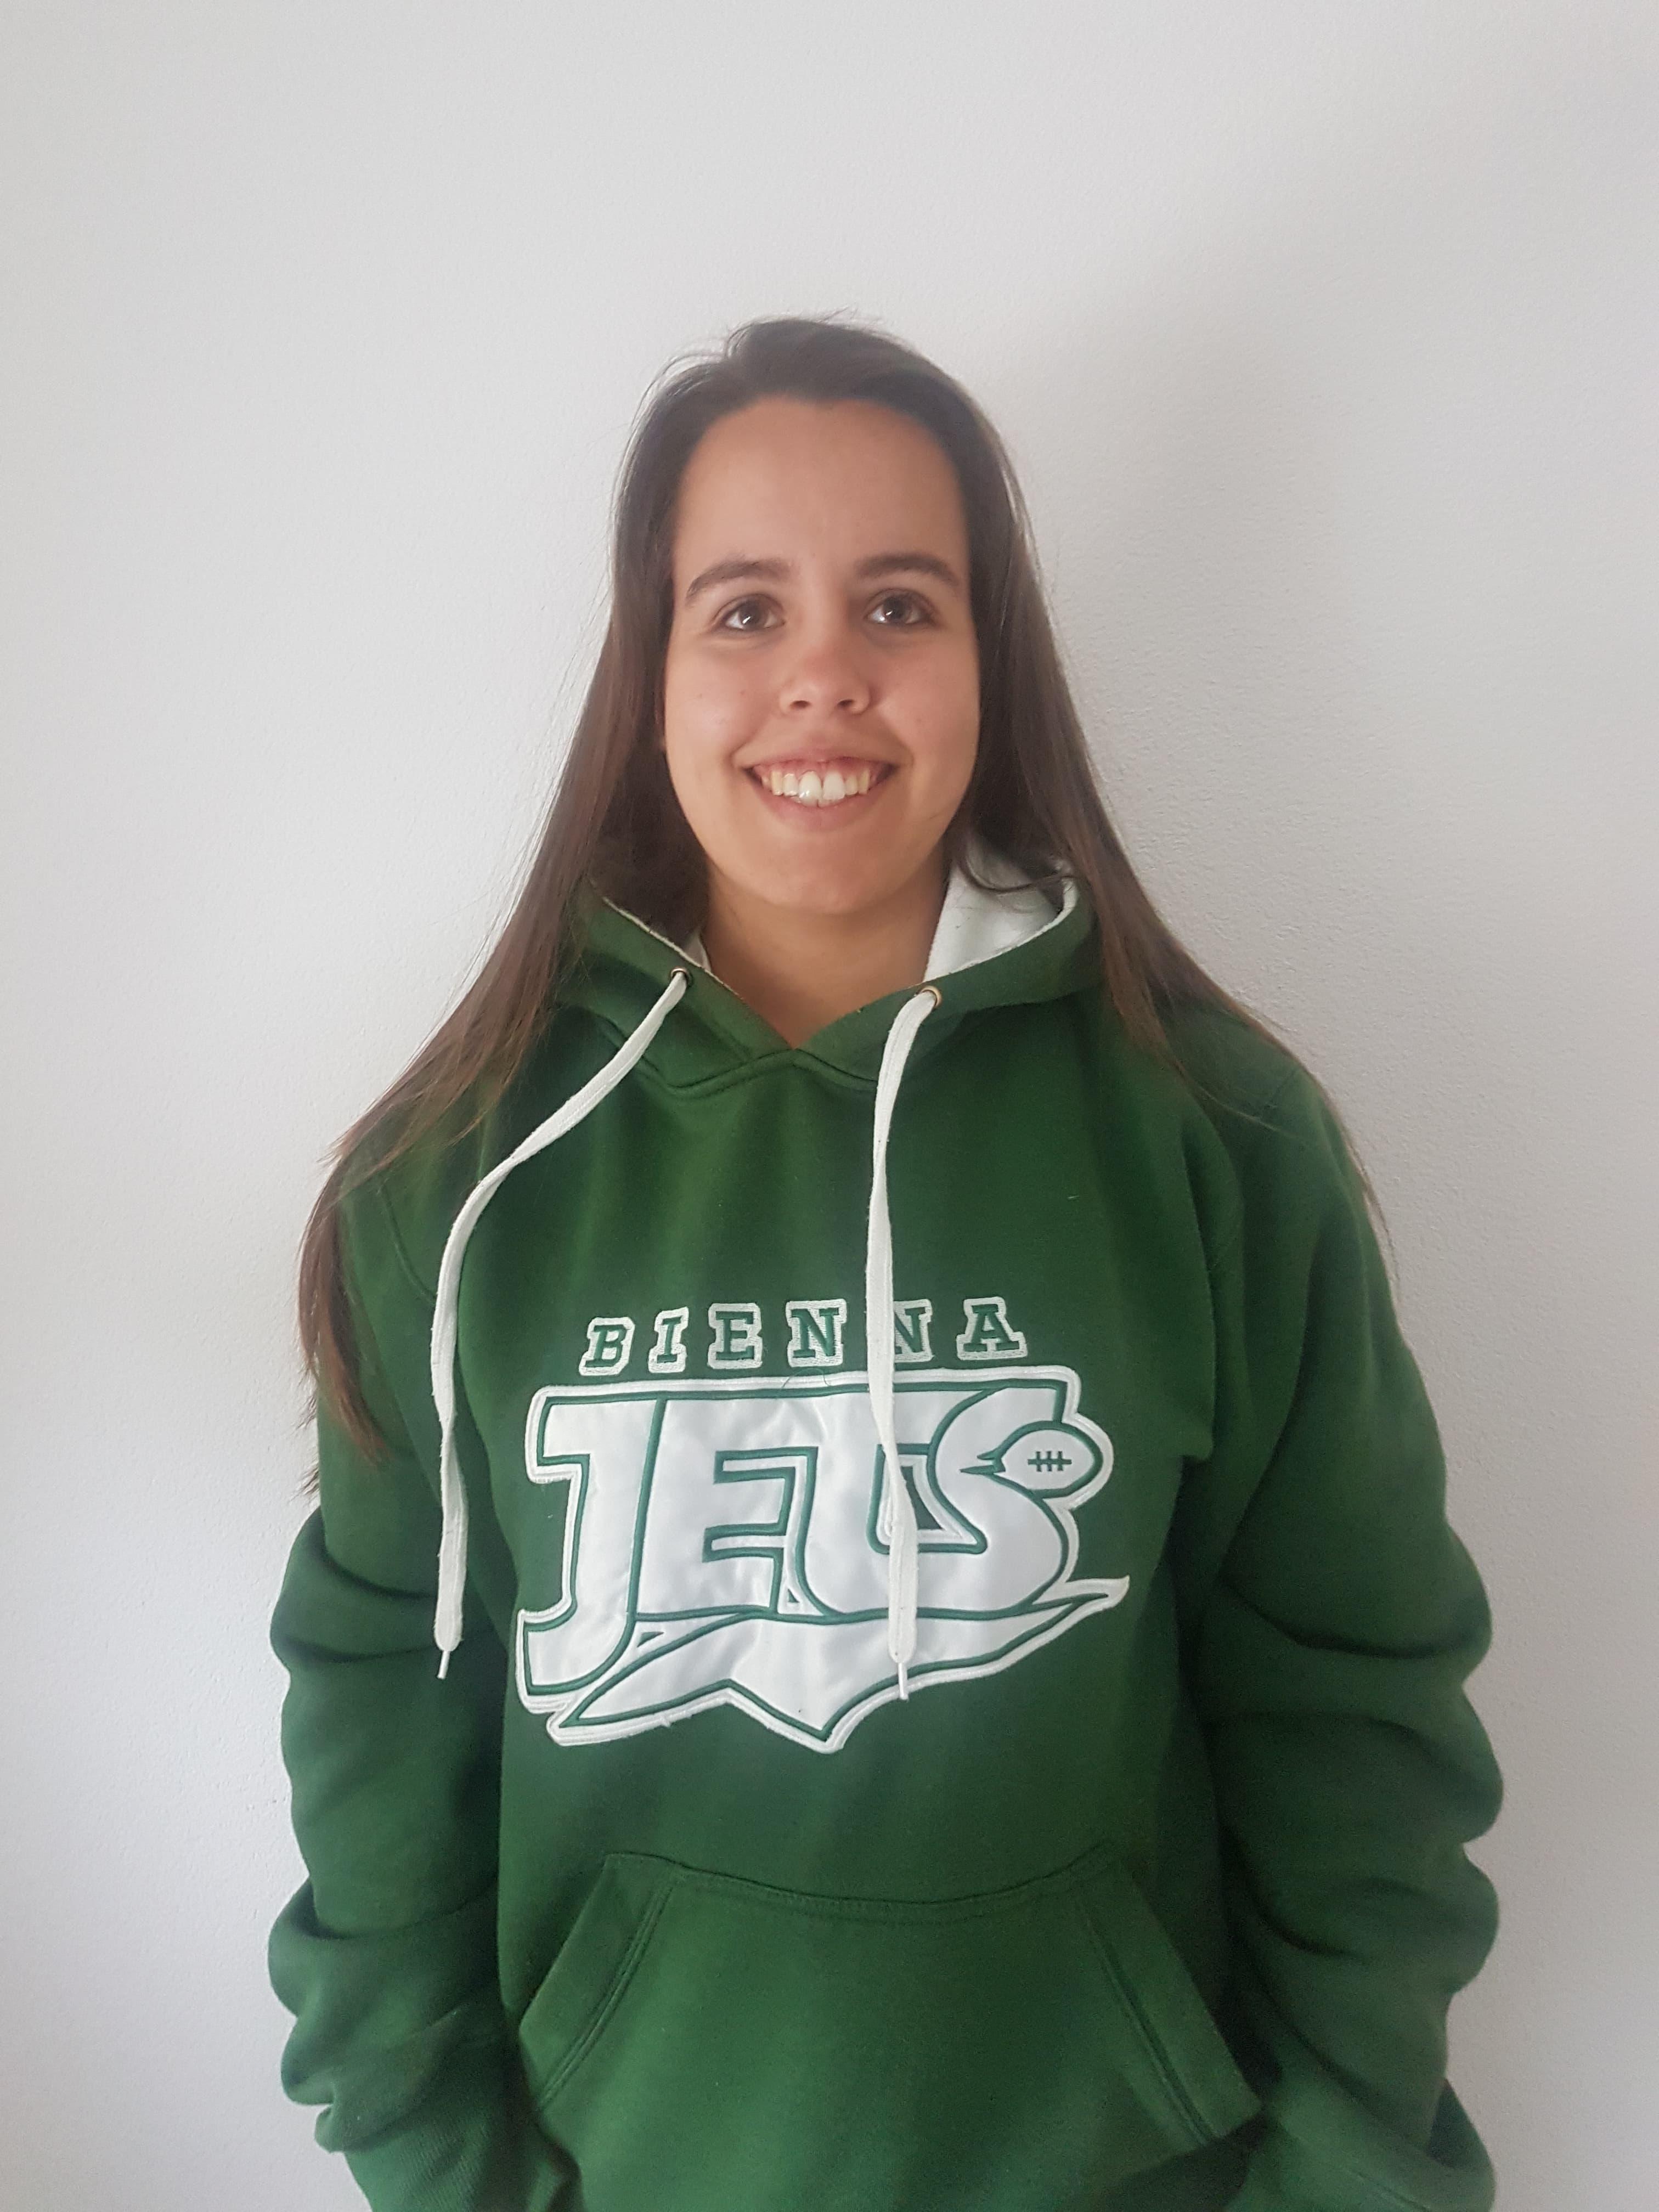 Joana Dias : Kassiererin